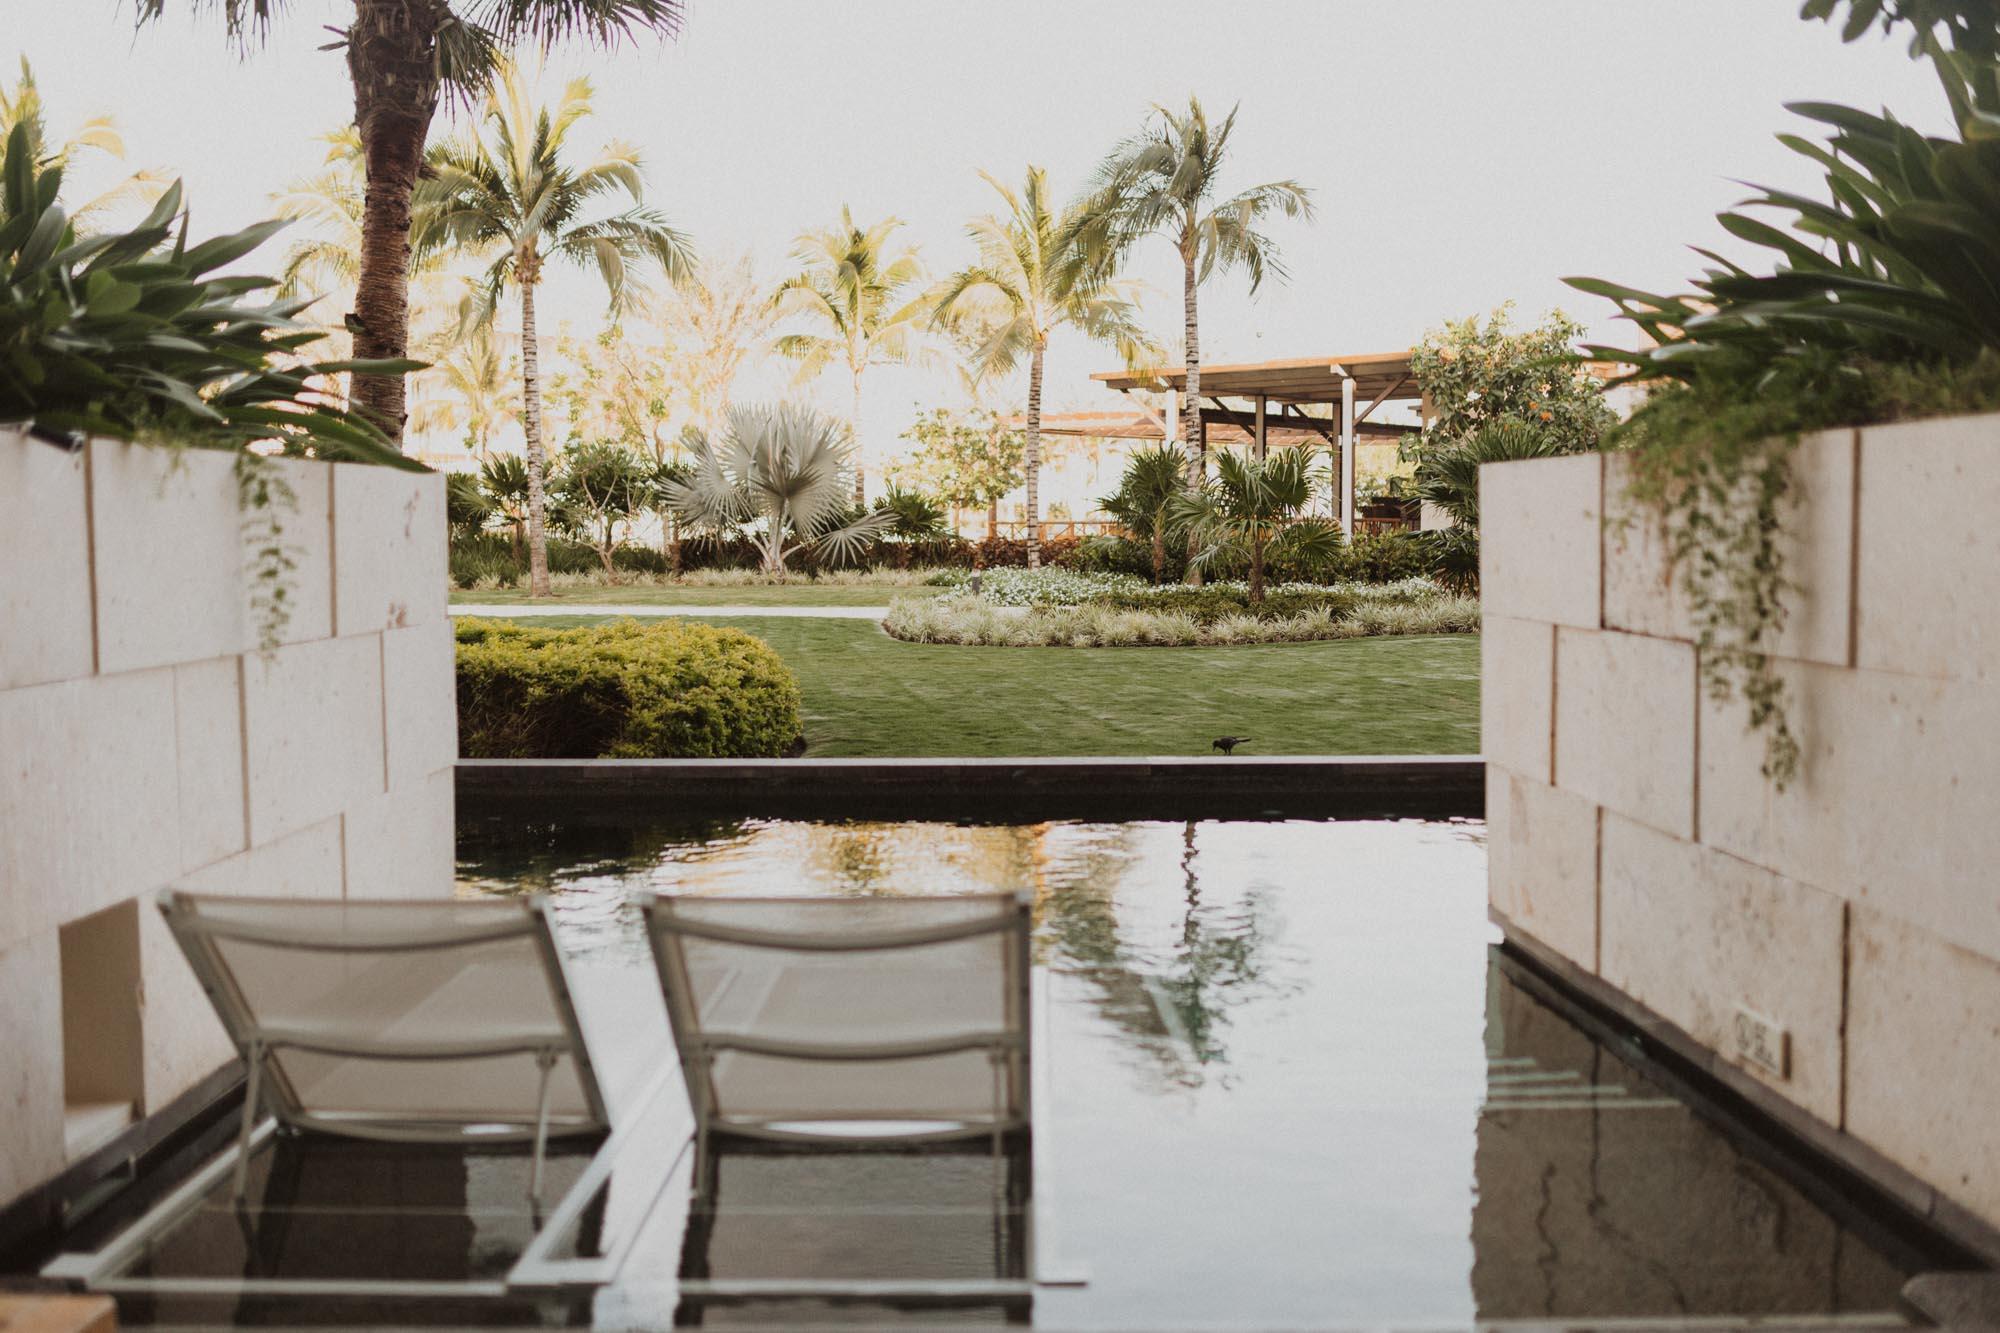 Honeymoon in Mexican resort hotel swim up pool